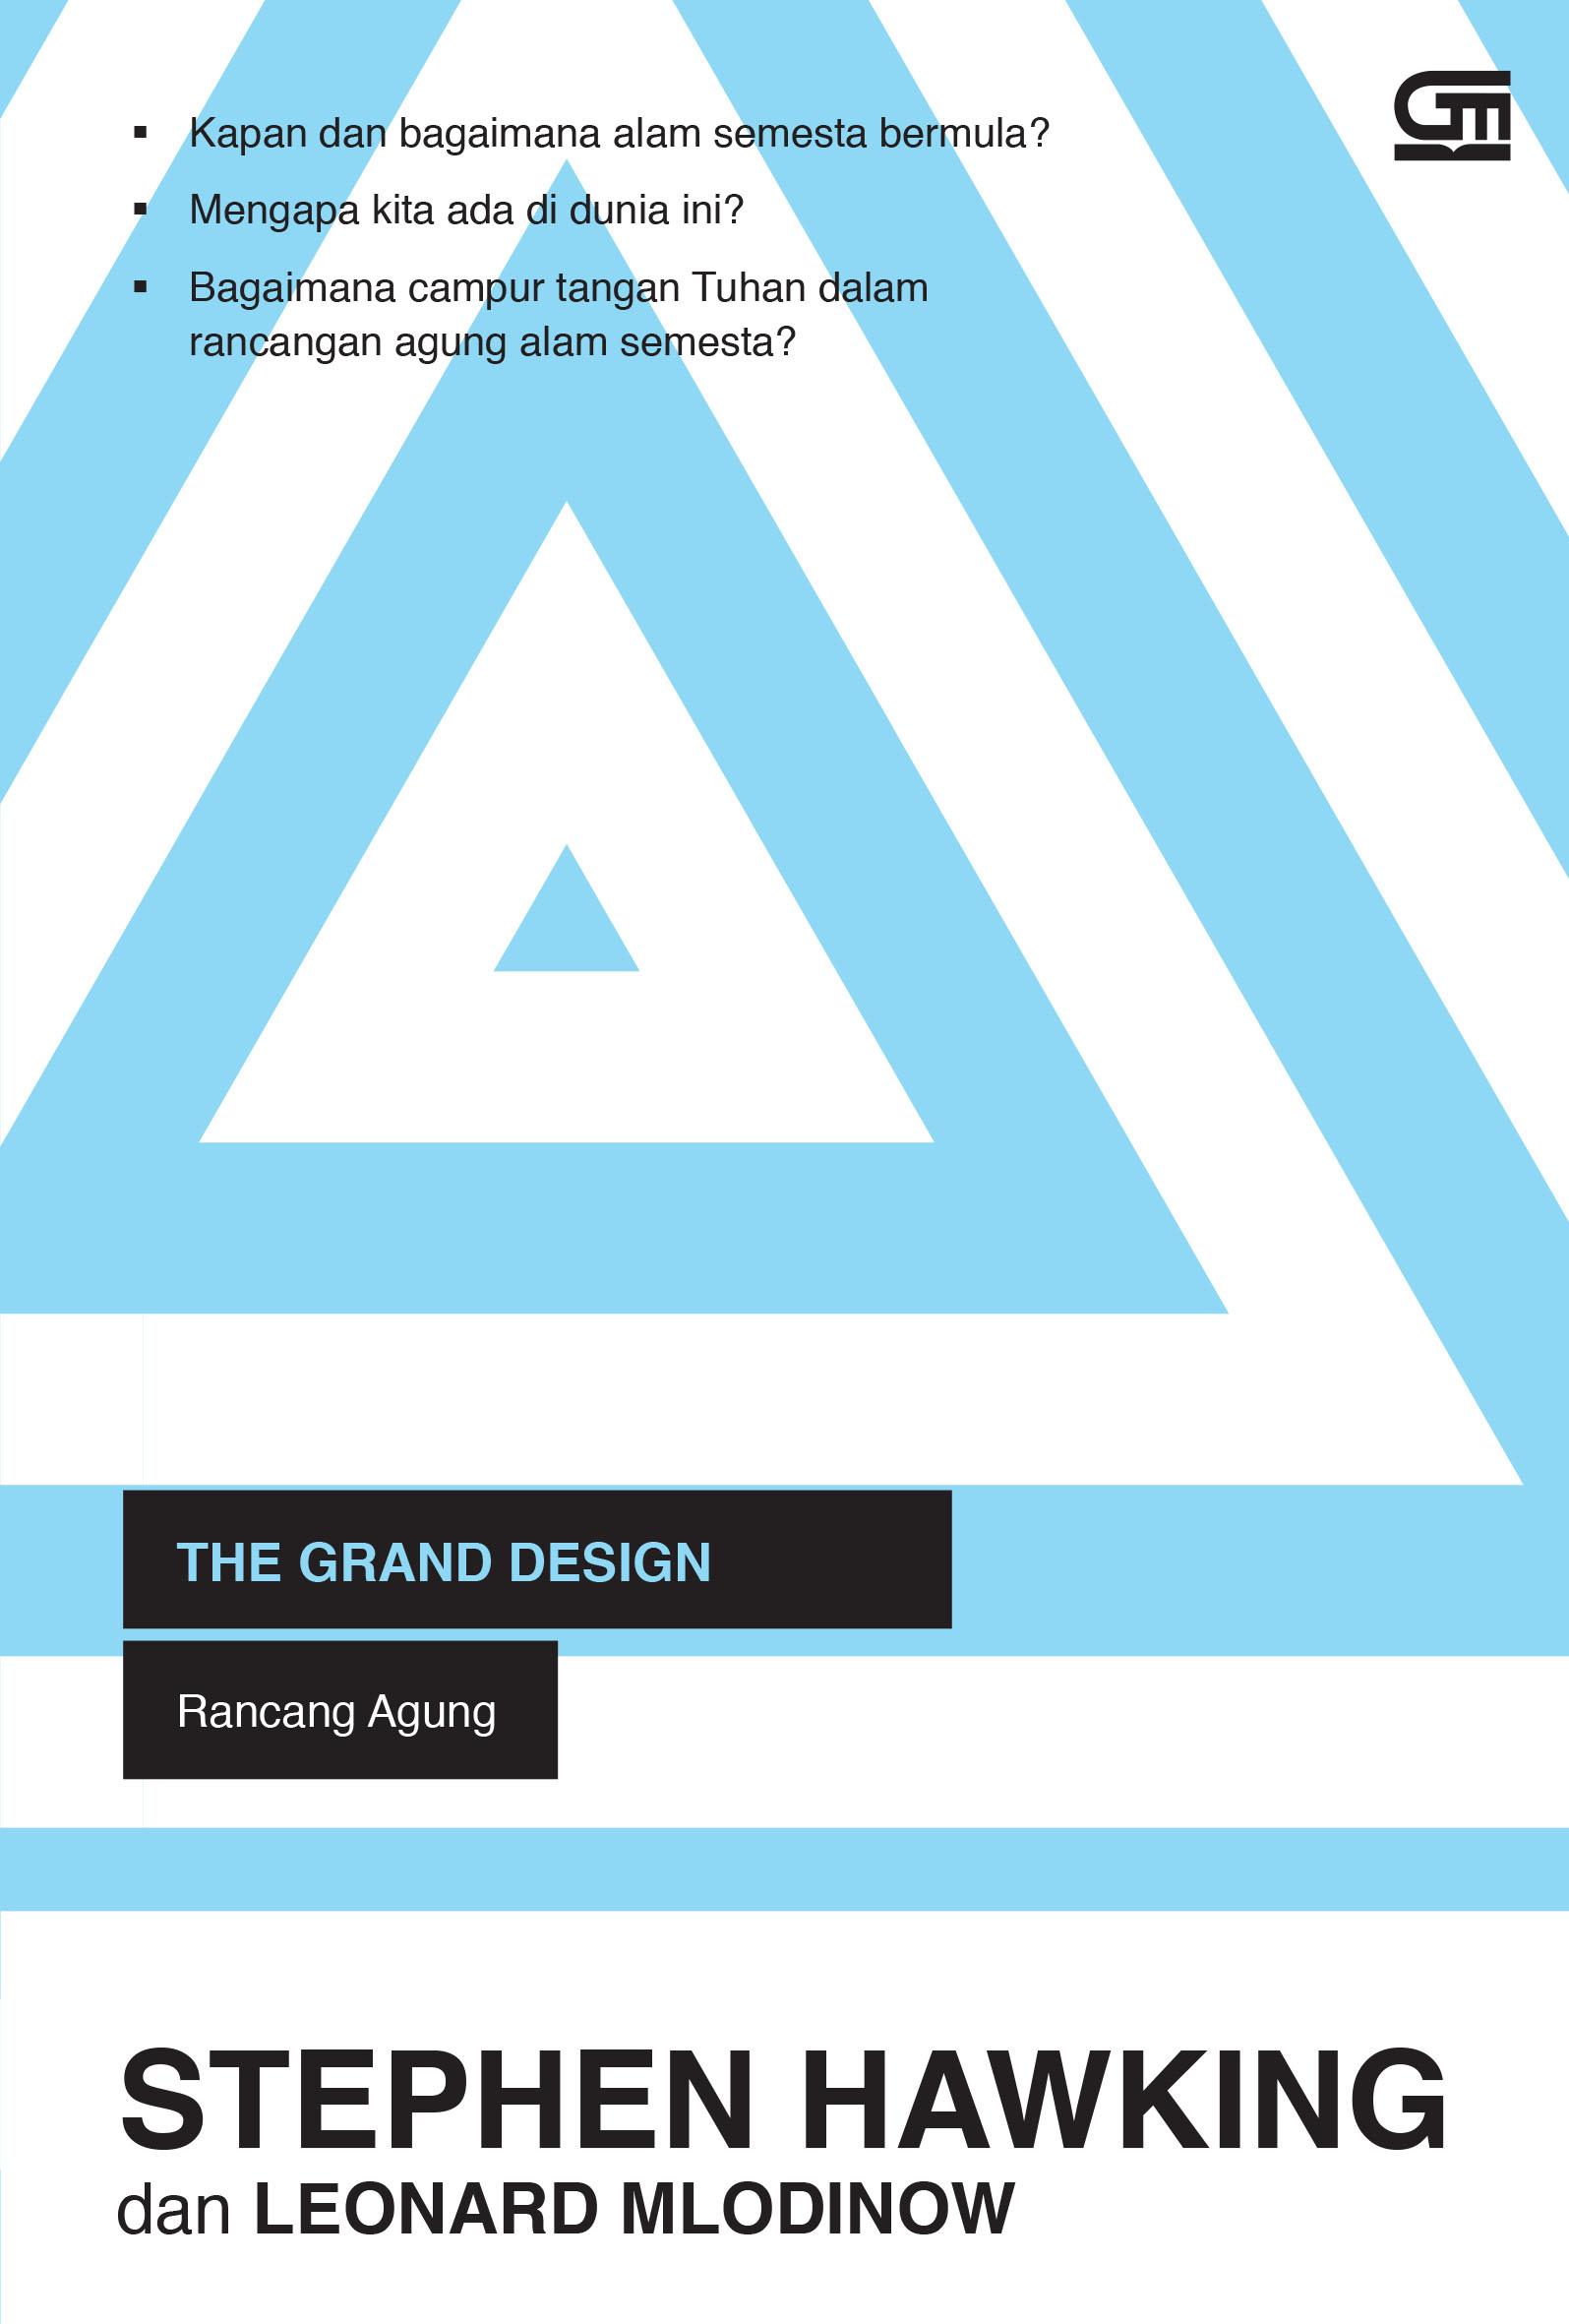 The Grand Design, Rancang Agung